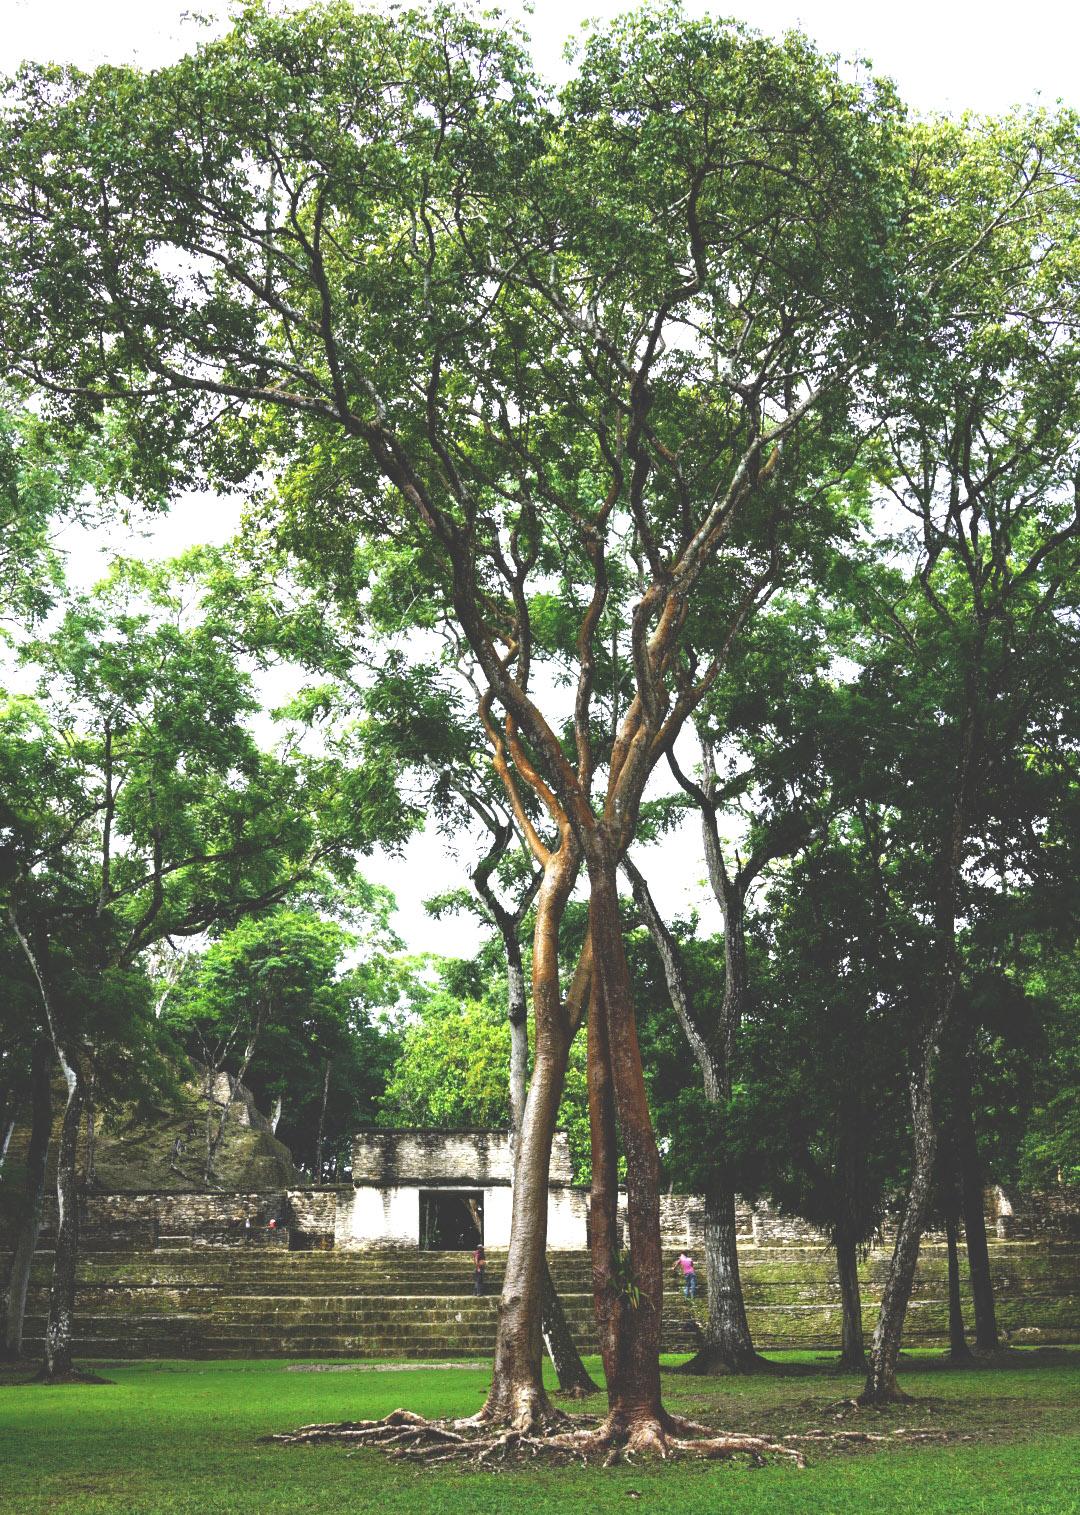 Cahal Pech Ruins in San Ignacio